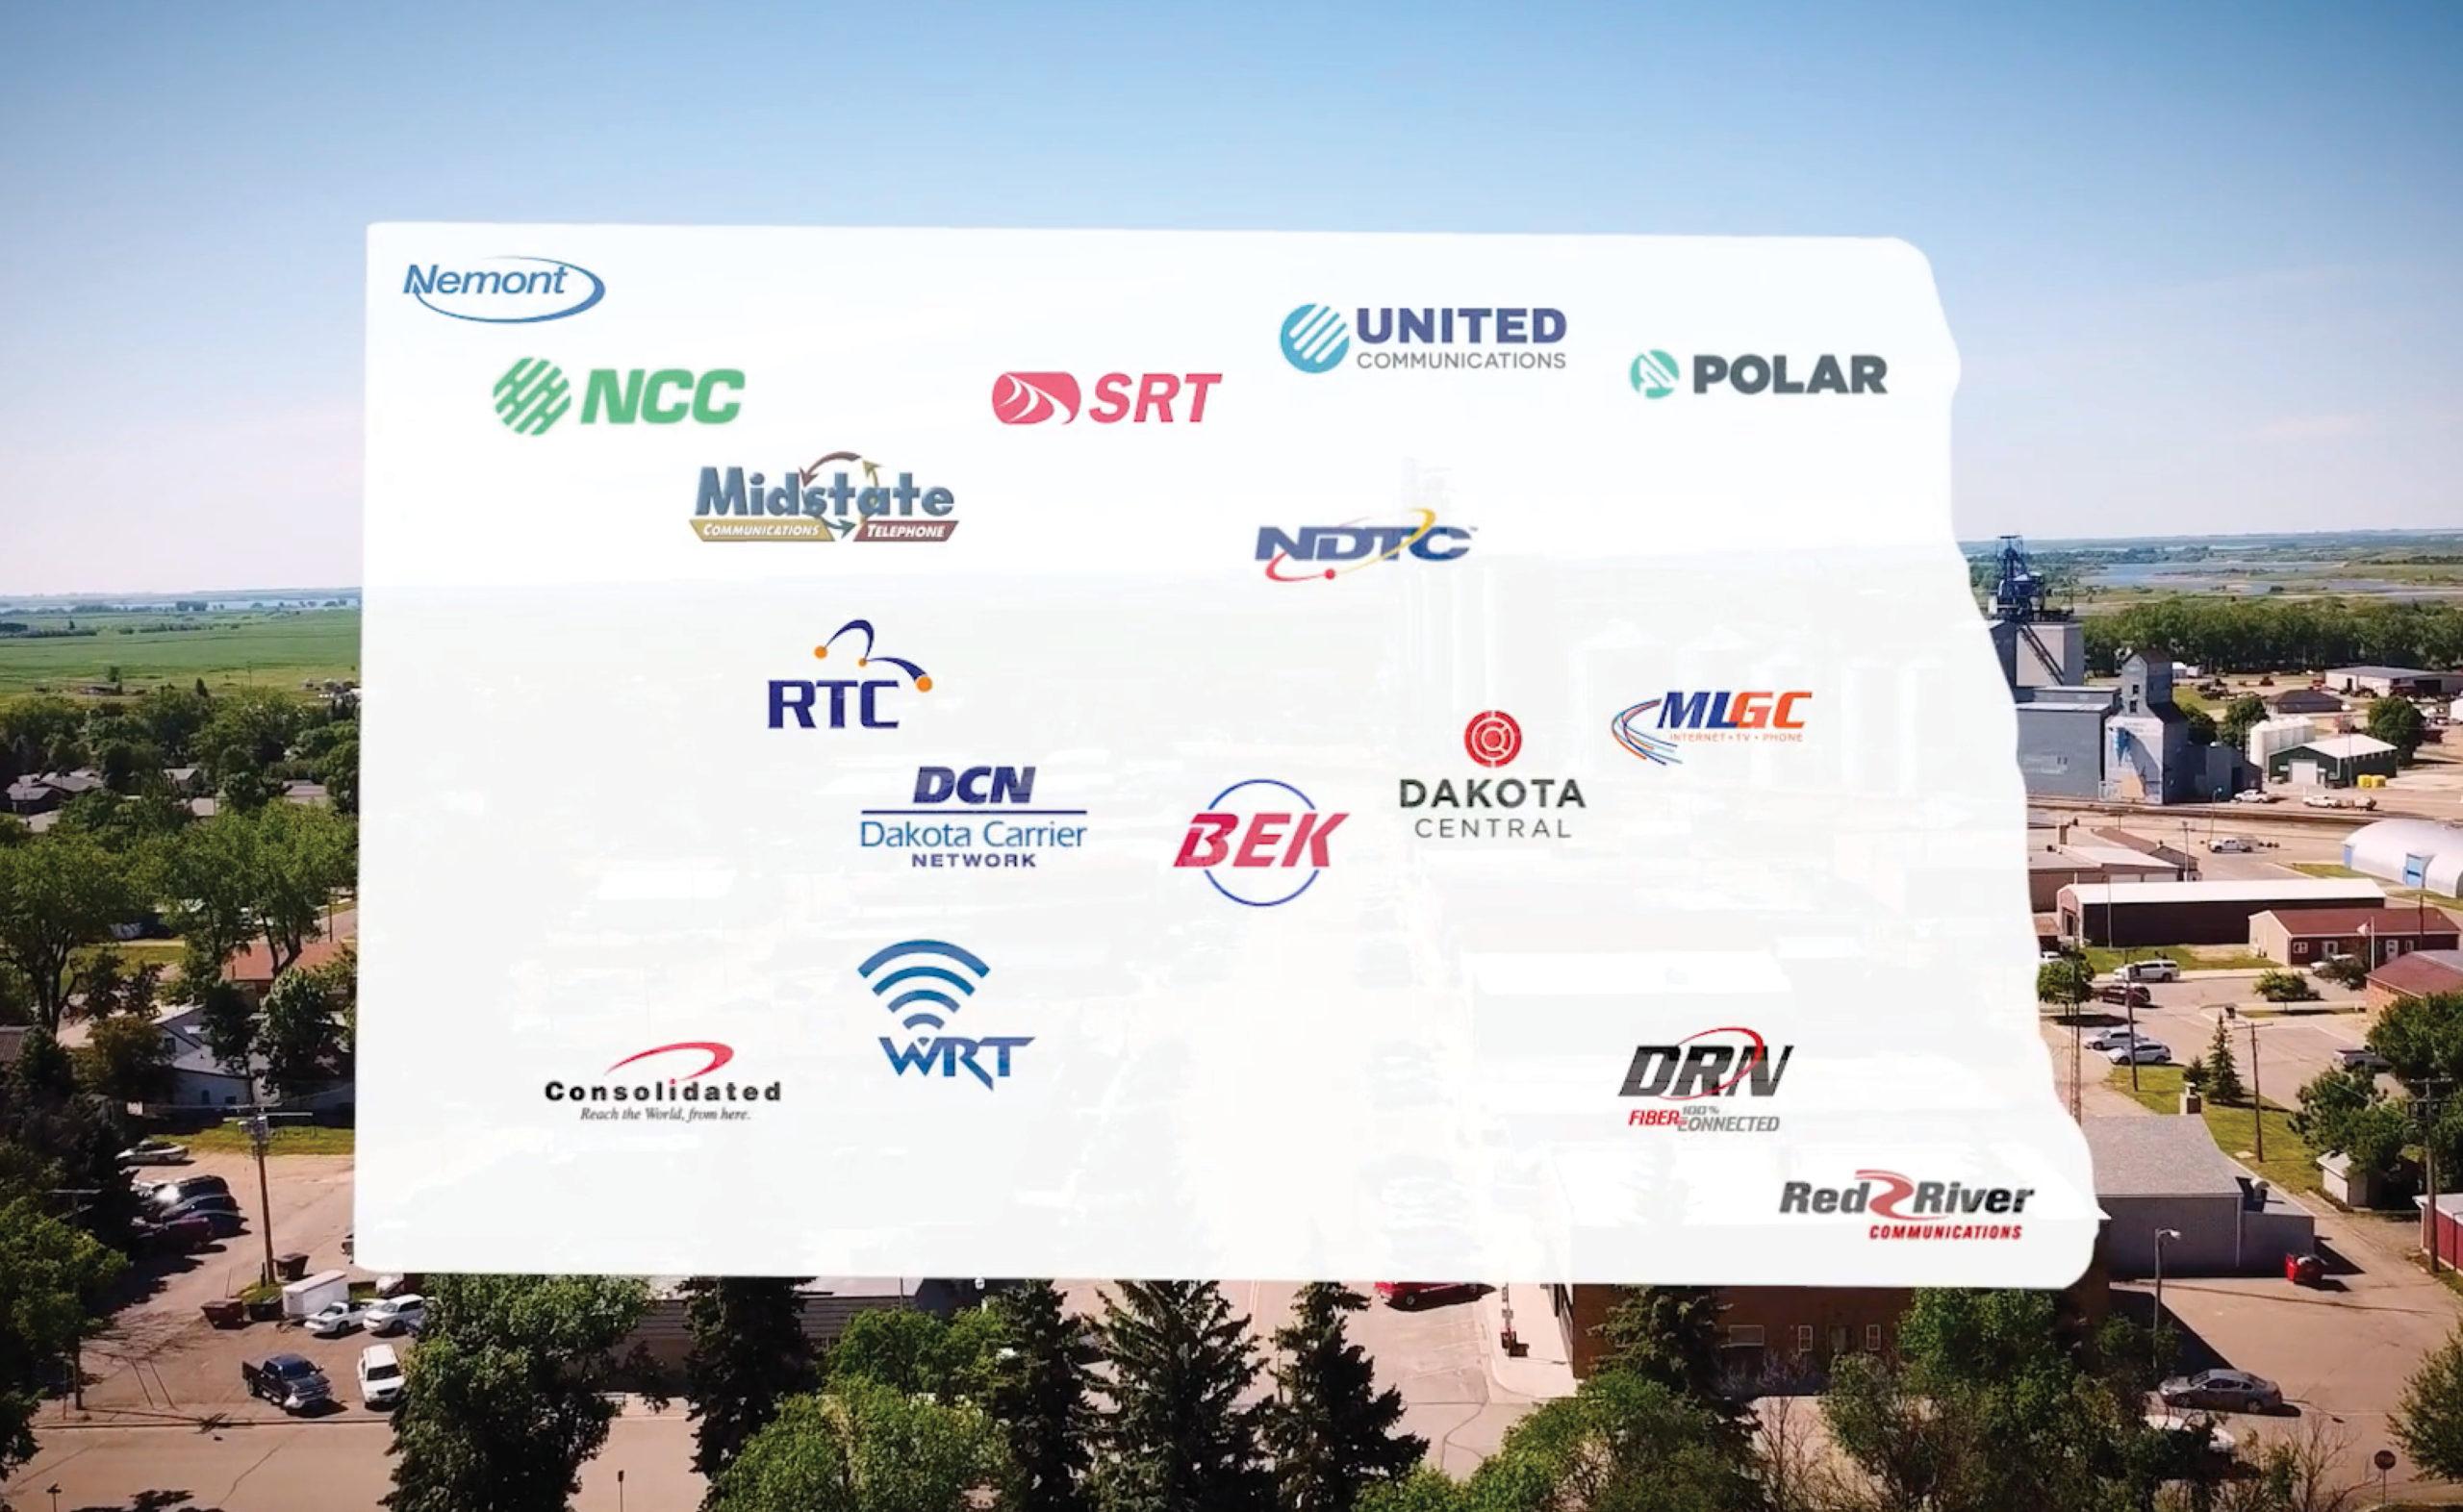 BAND member companies